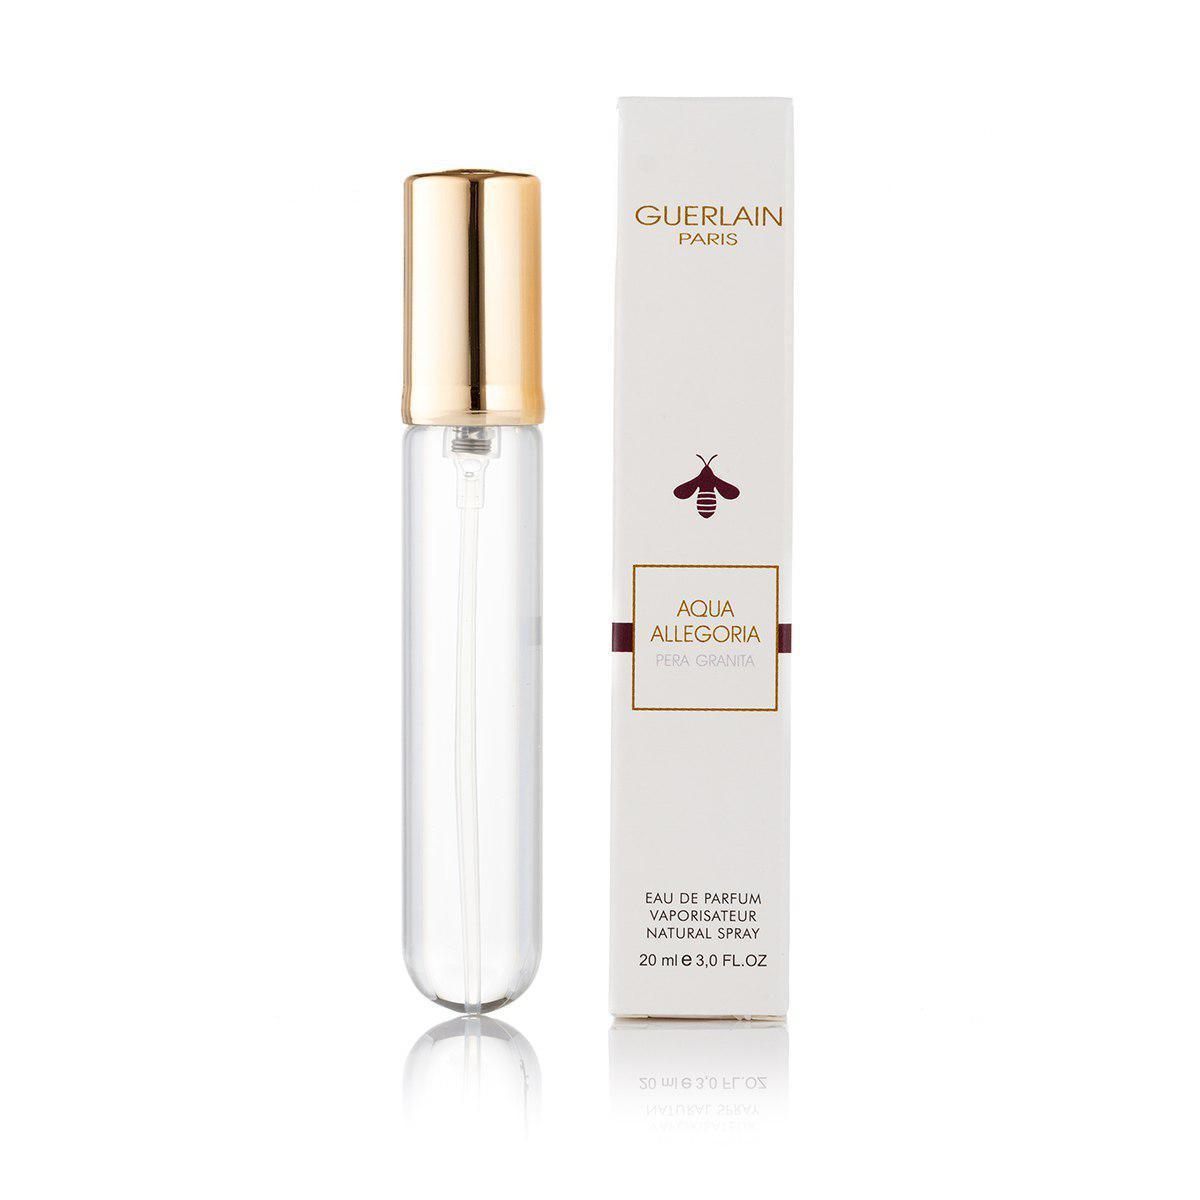 Женский парфюм Aqua Allegoria Pera Granita - 20 мл